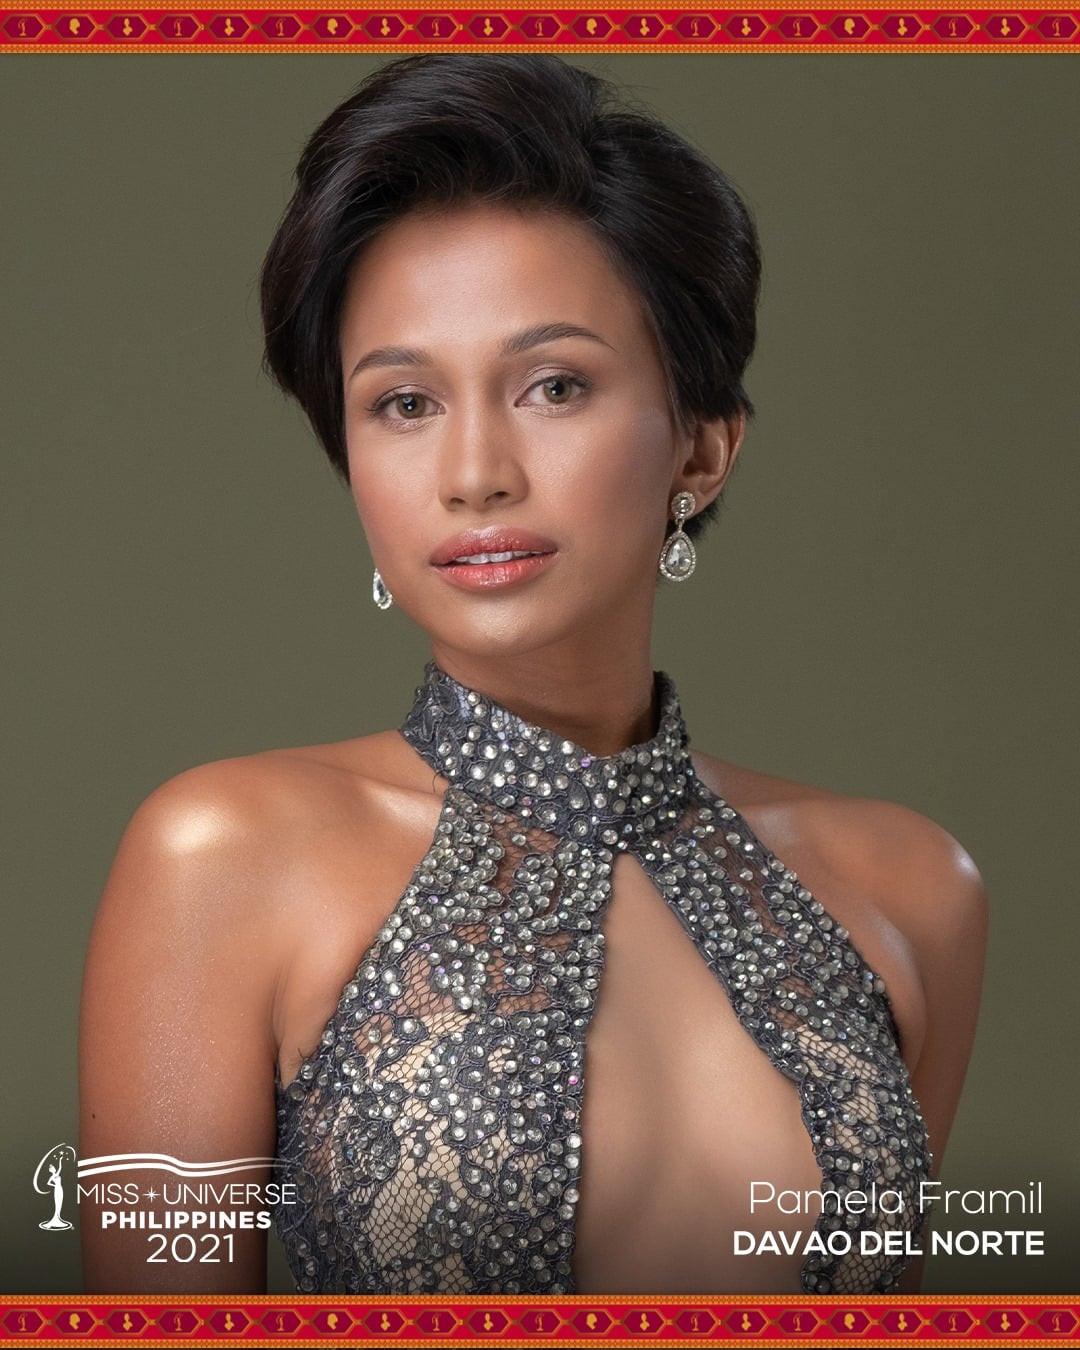 50 pre-candidatas a miss universe philippines 2021. - Página 3 REFmg9